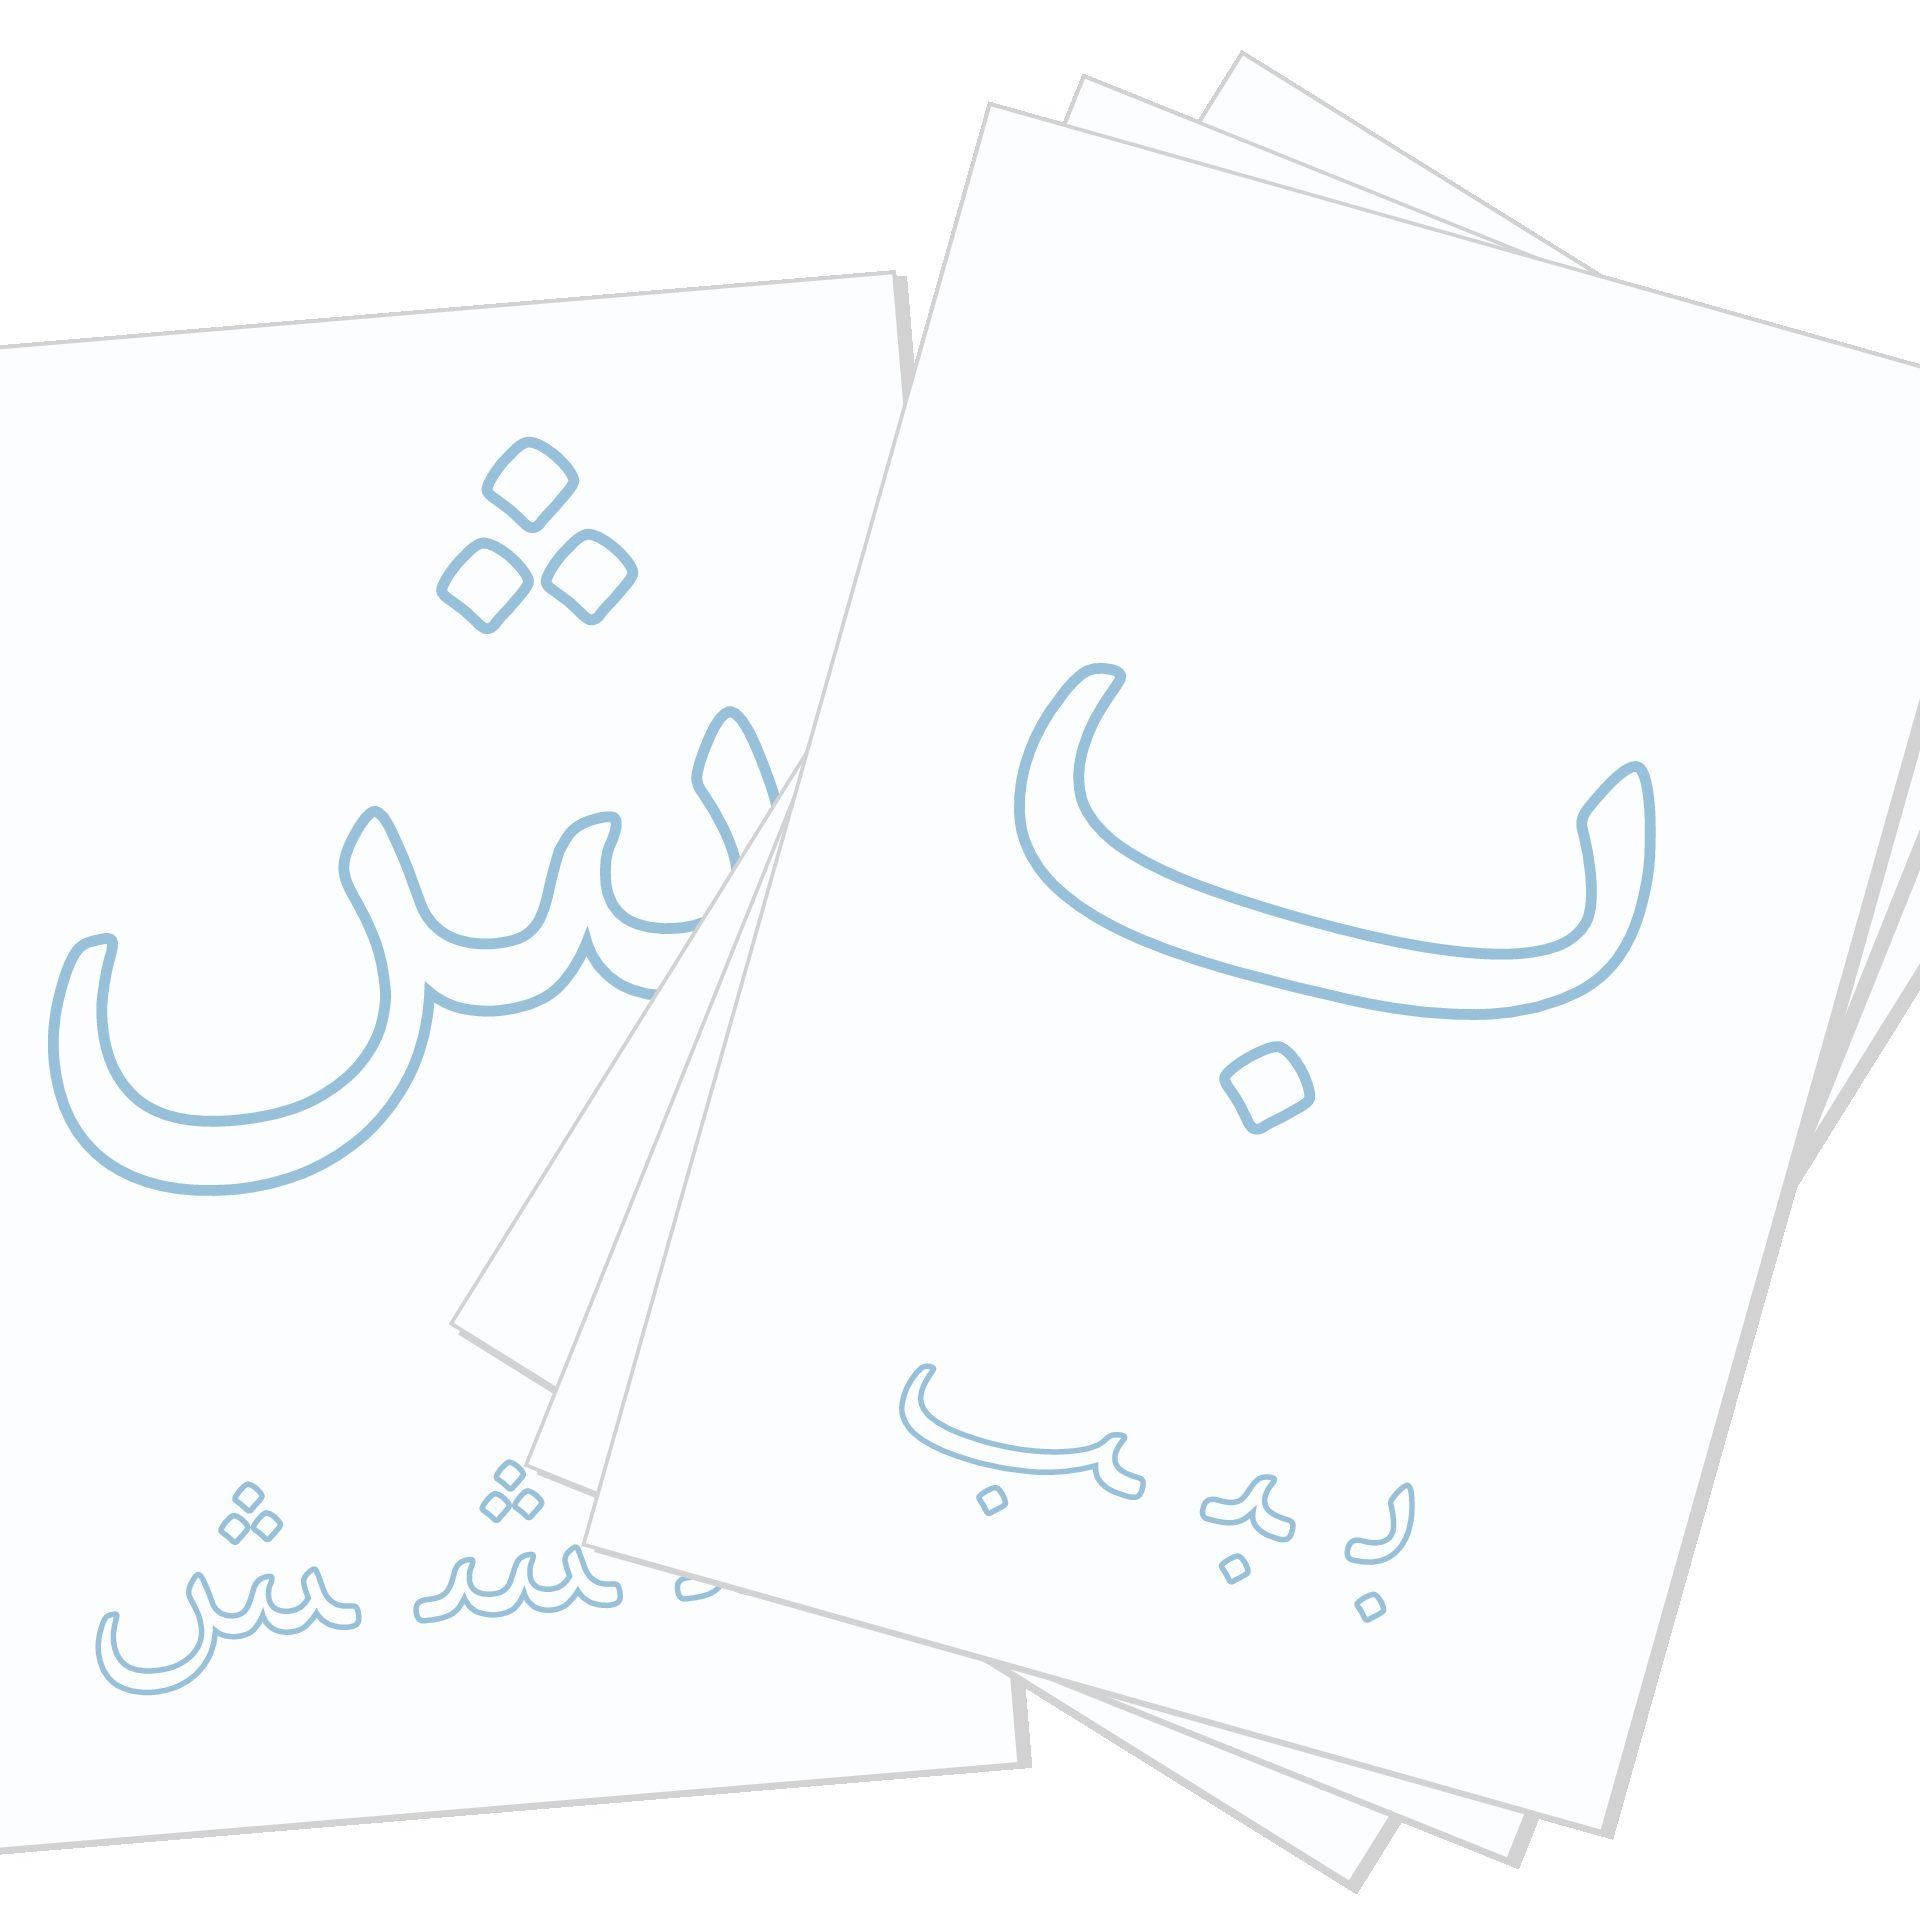 Lettre D'alphabet Arabe - Lettre Rugueuse Arabe | Daradam concernant Modele Lettre Alphabet